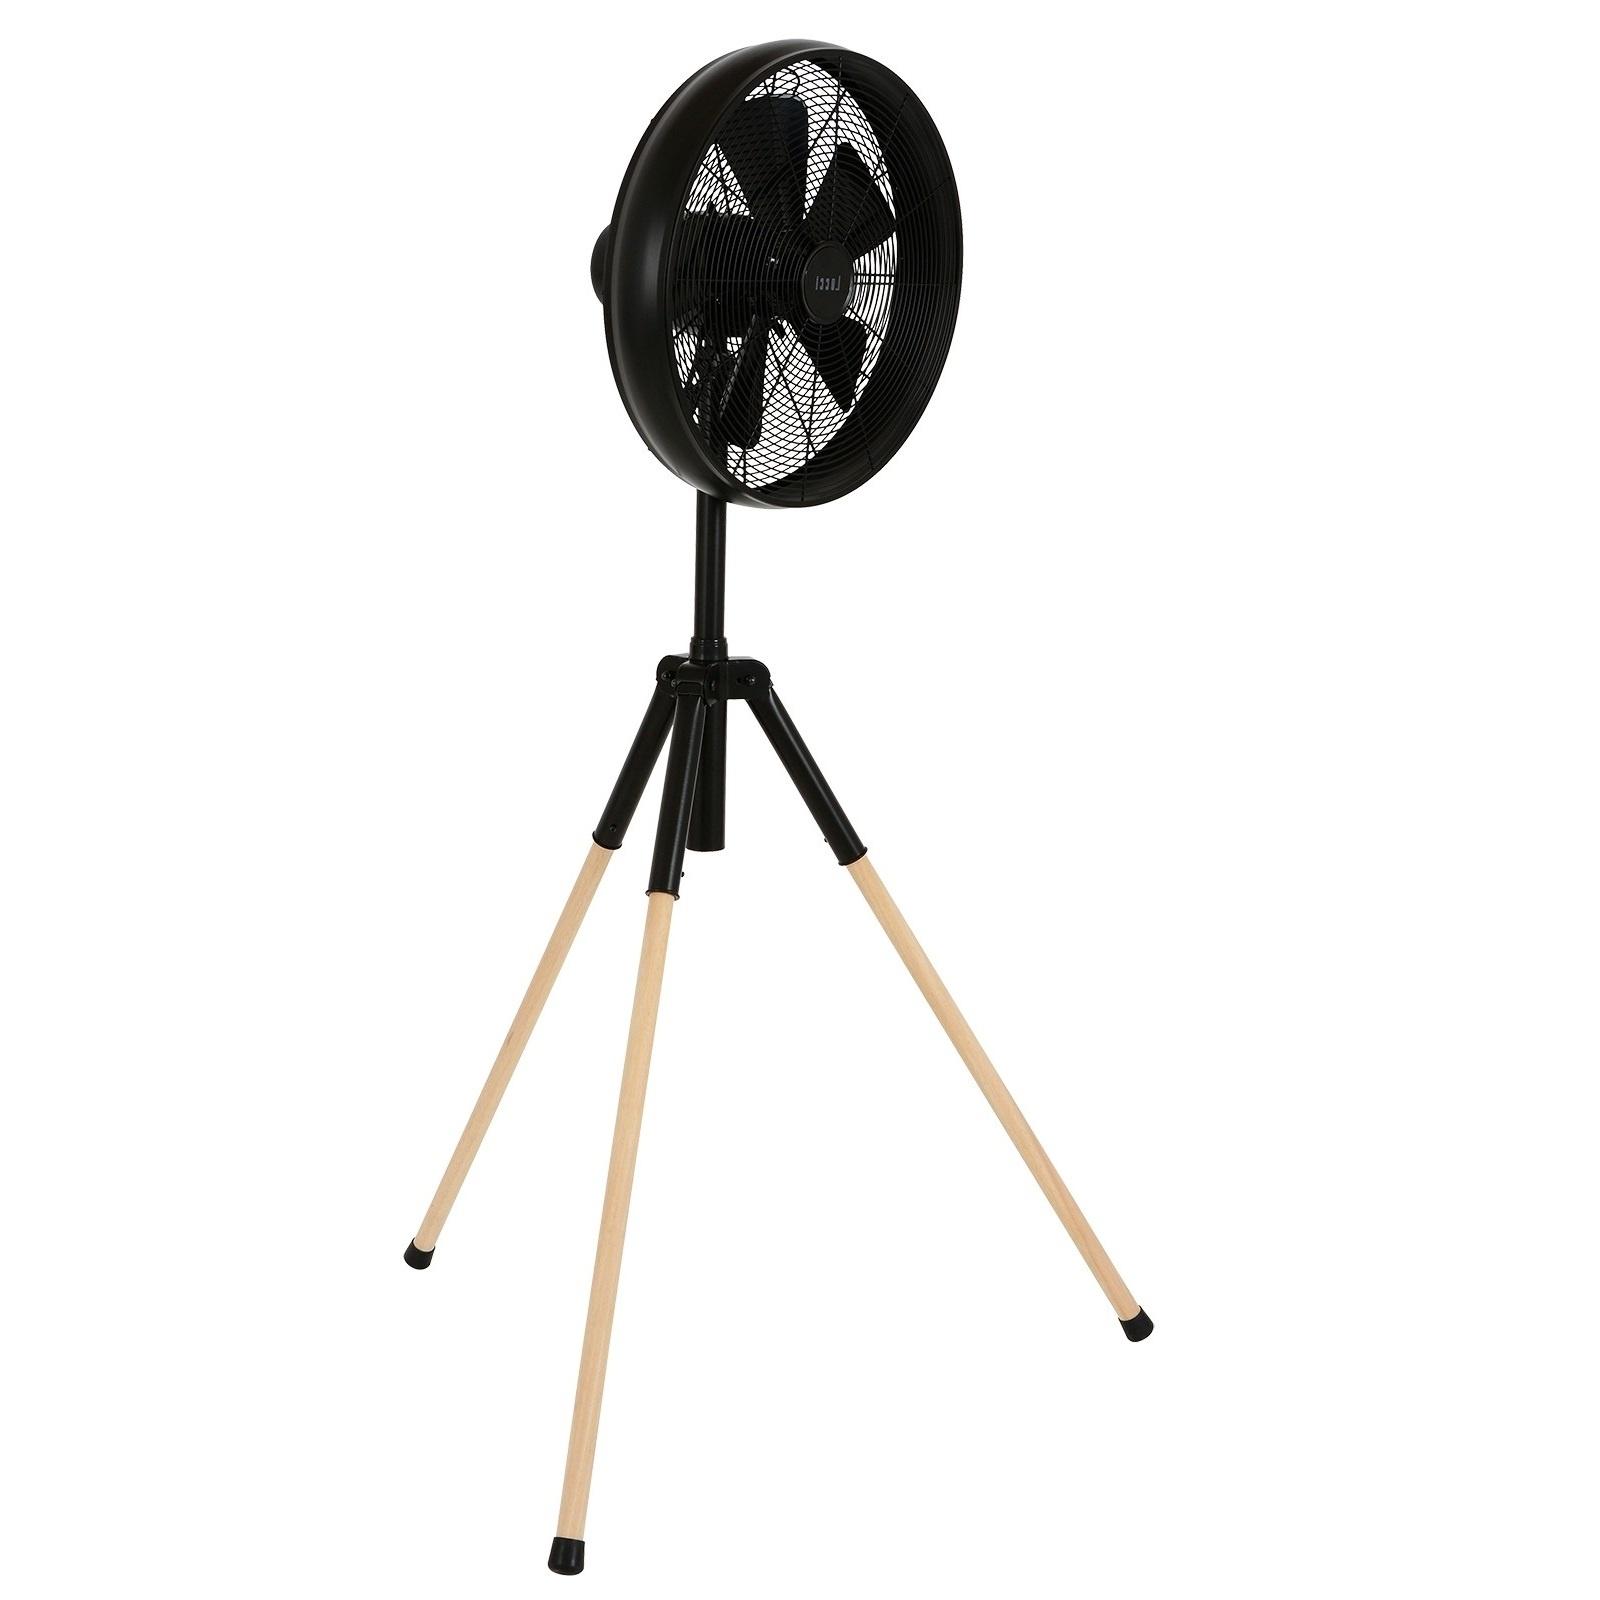 Ventilator Breeze Tripod Black 41cm